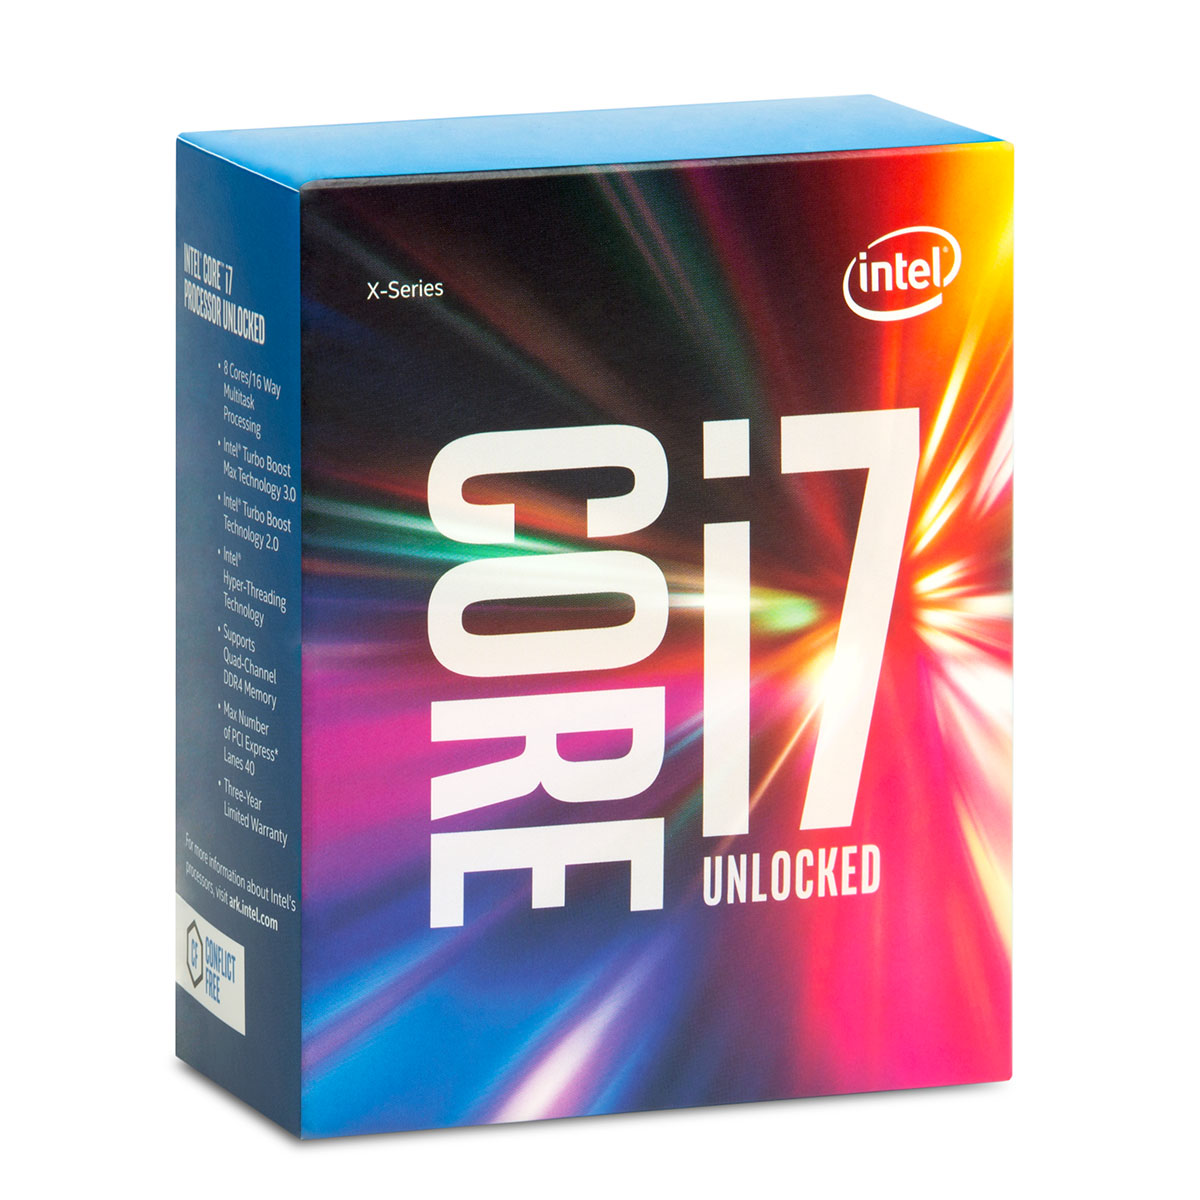 Intel-Core-i7-5800K